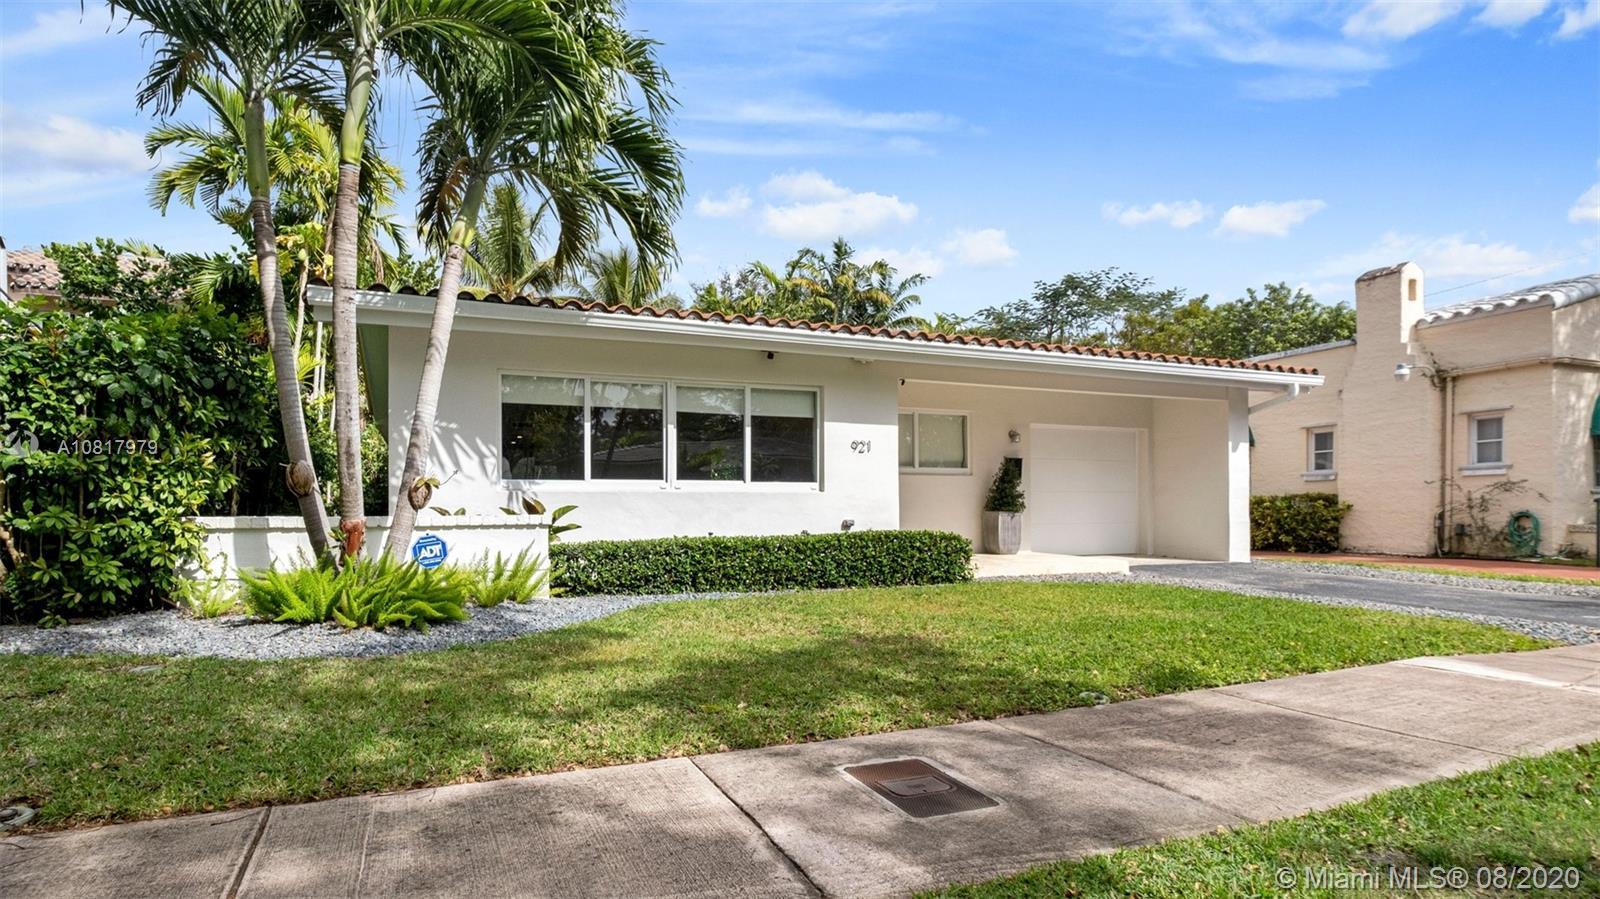 921  Ortega Ave  For Sale A10817979, FL